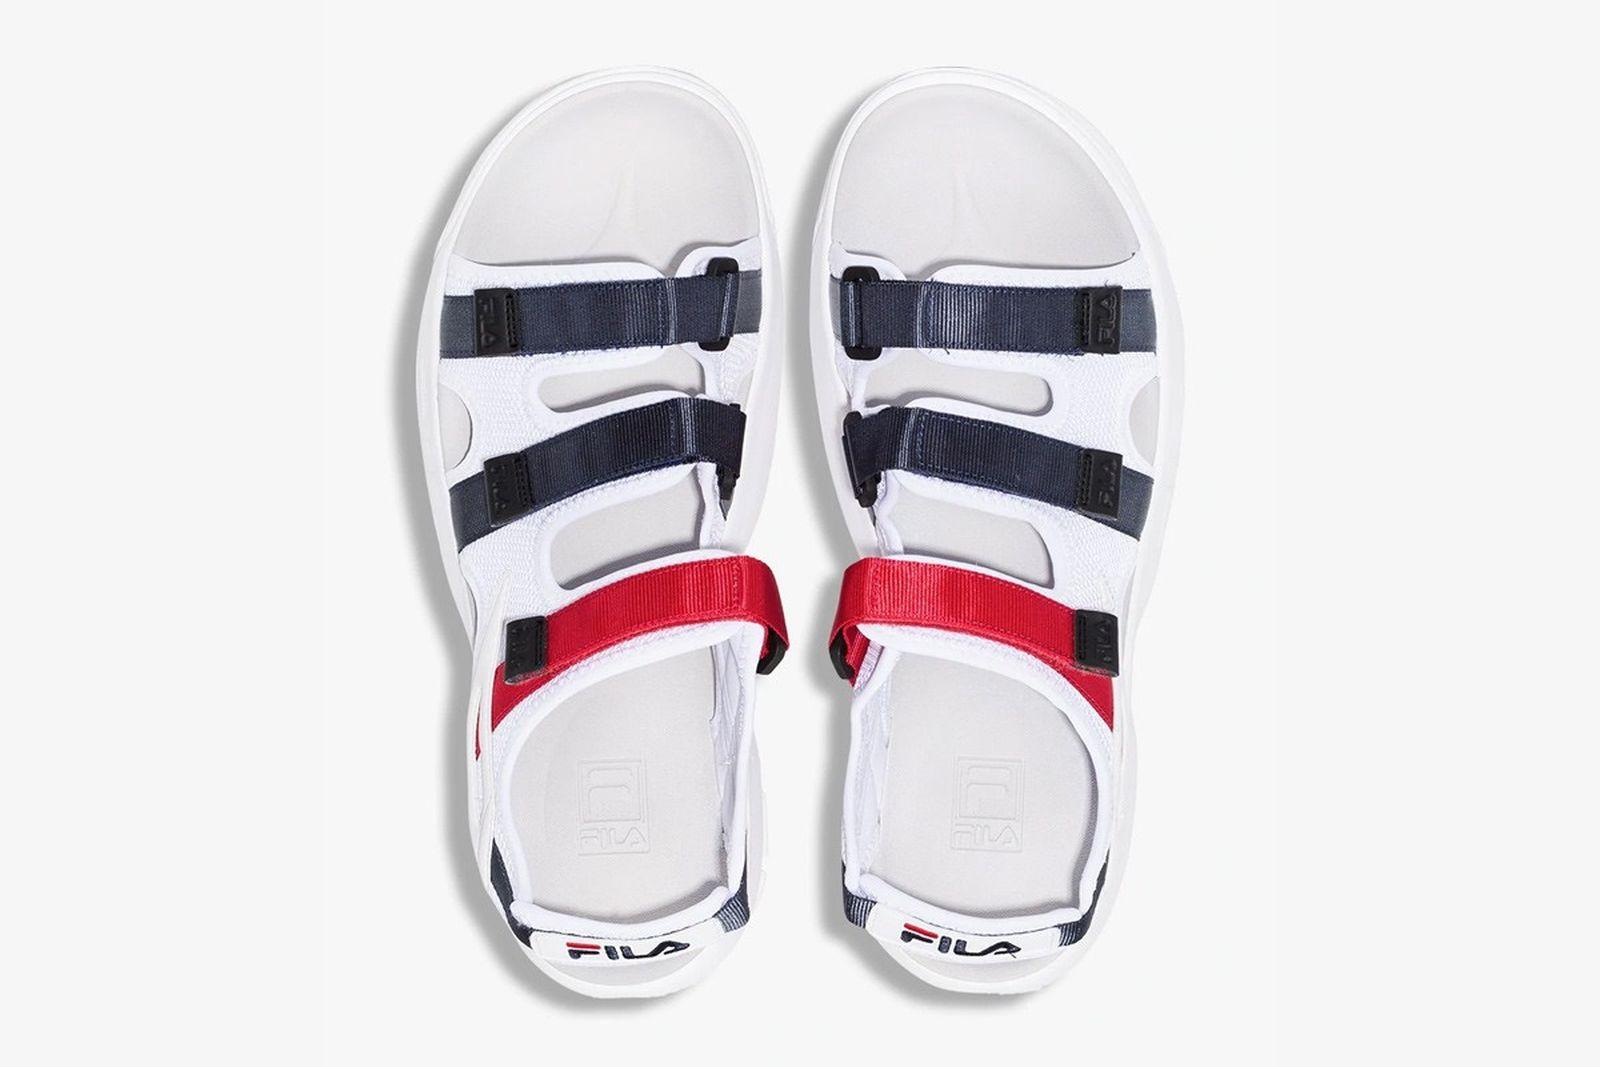 fila-disrupter-strappy-sandal-release-date-price-02